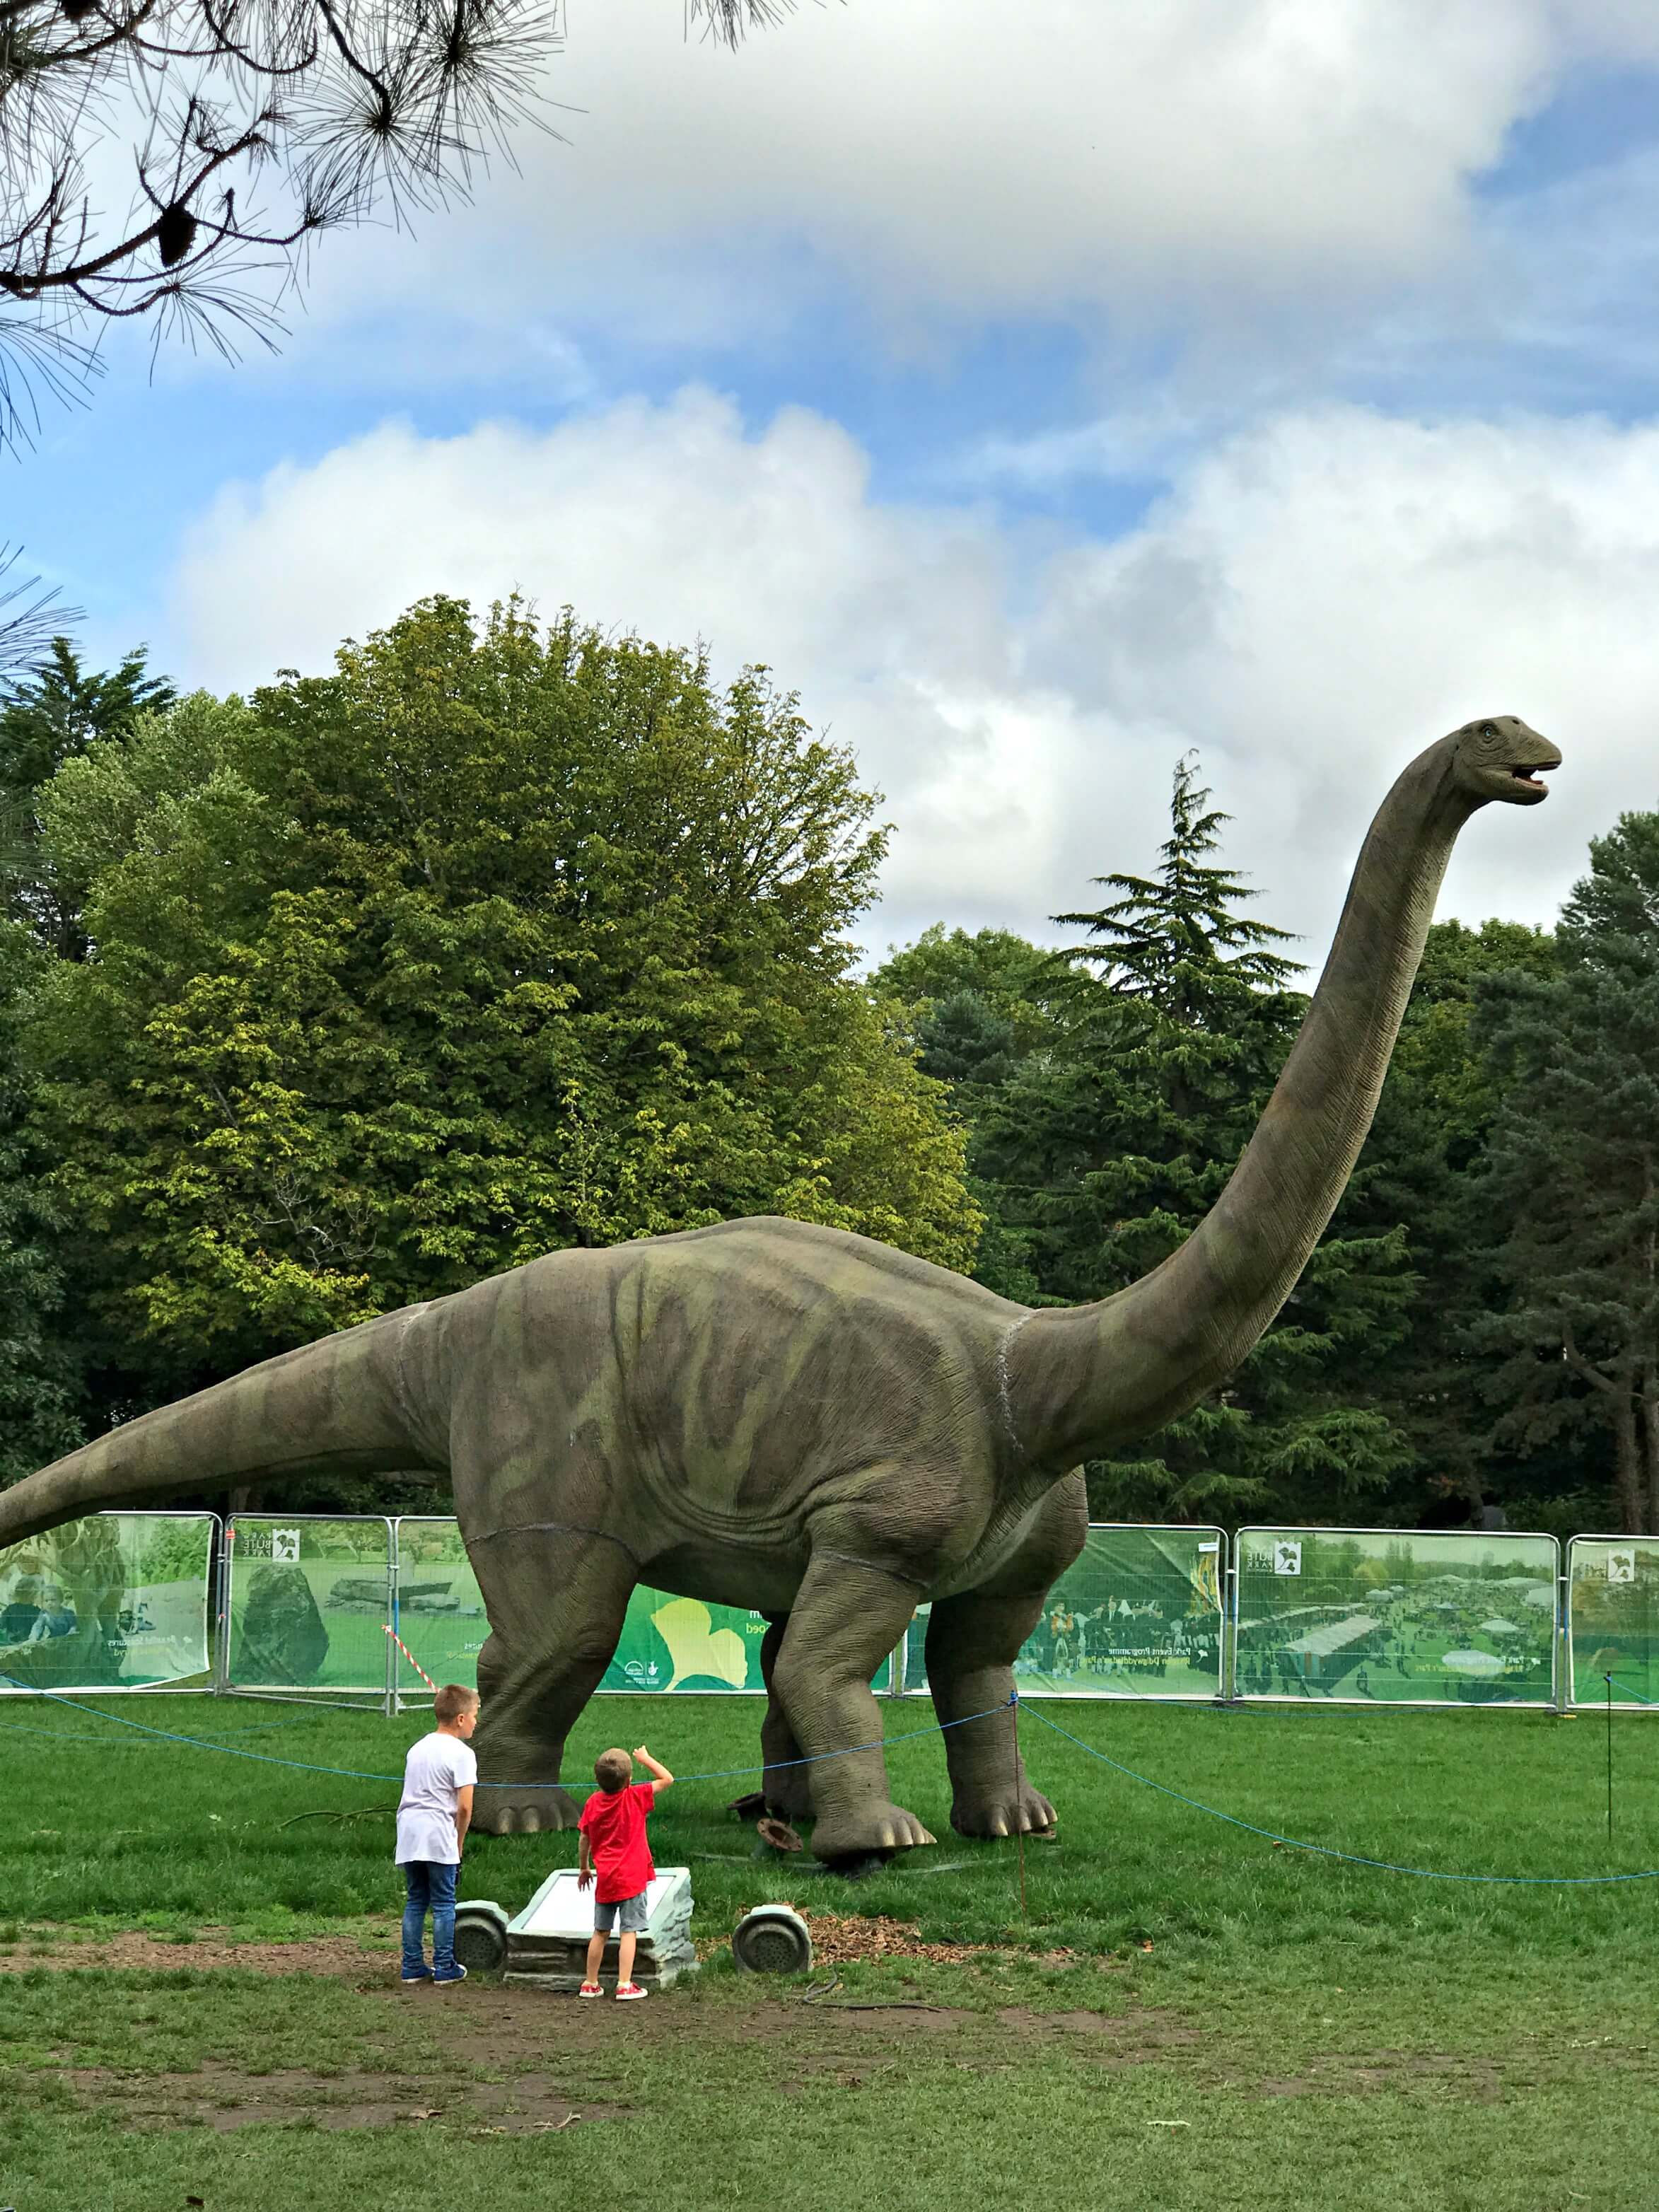 Jurassic Kingdom - 2 kids in front of a brontosaurus